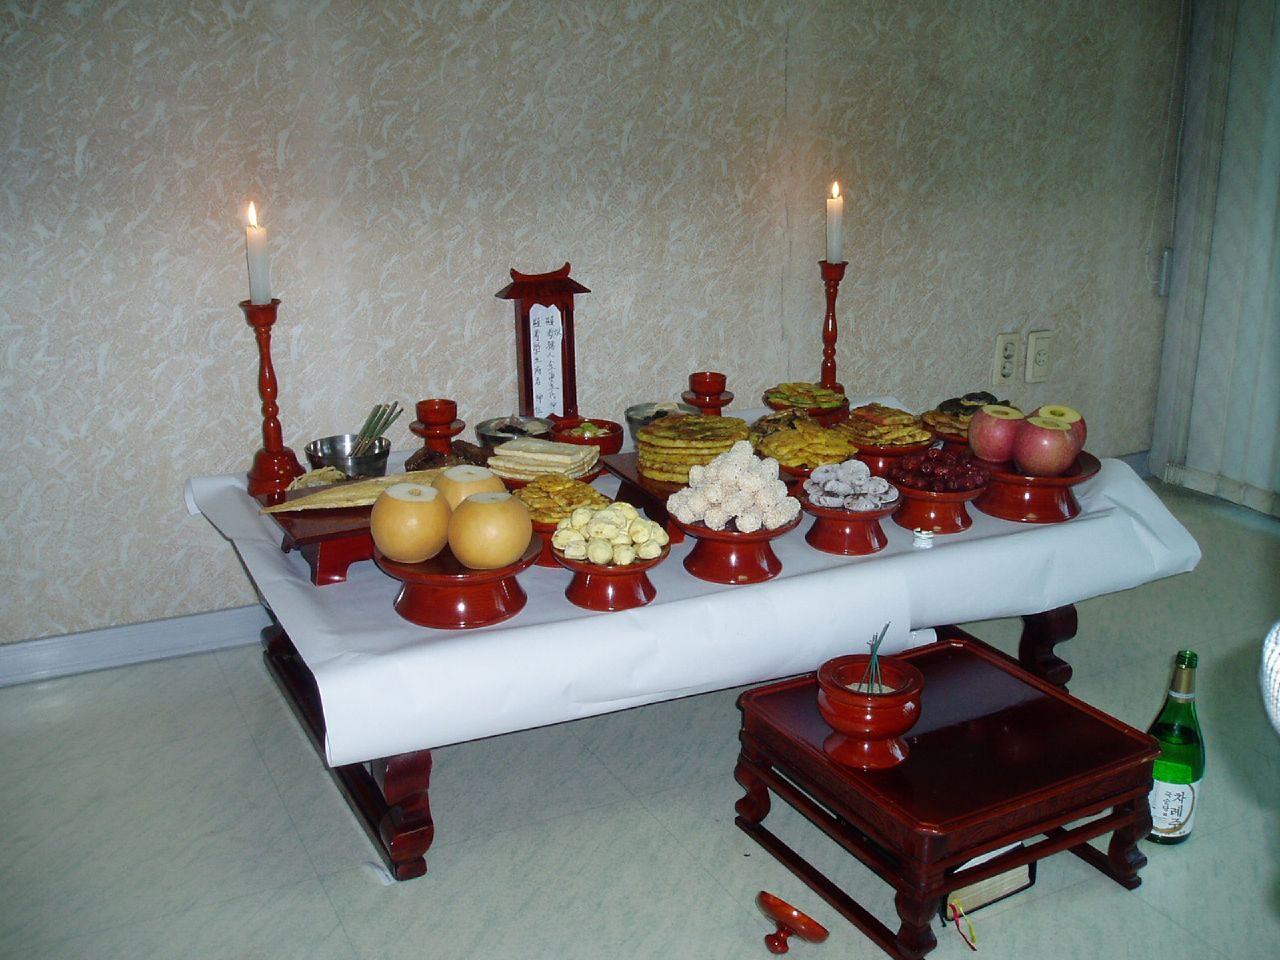 filekorean culturejesa02jpg wikimedia commons